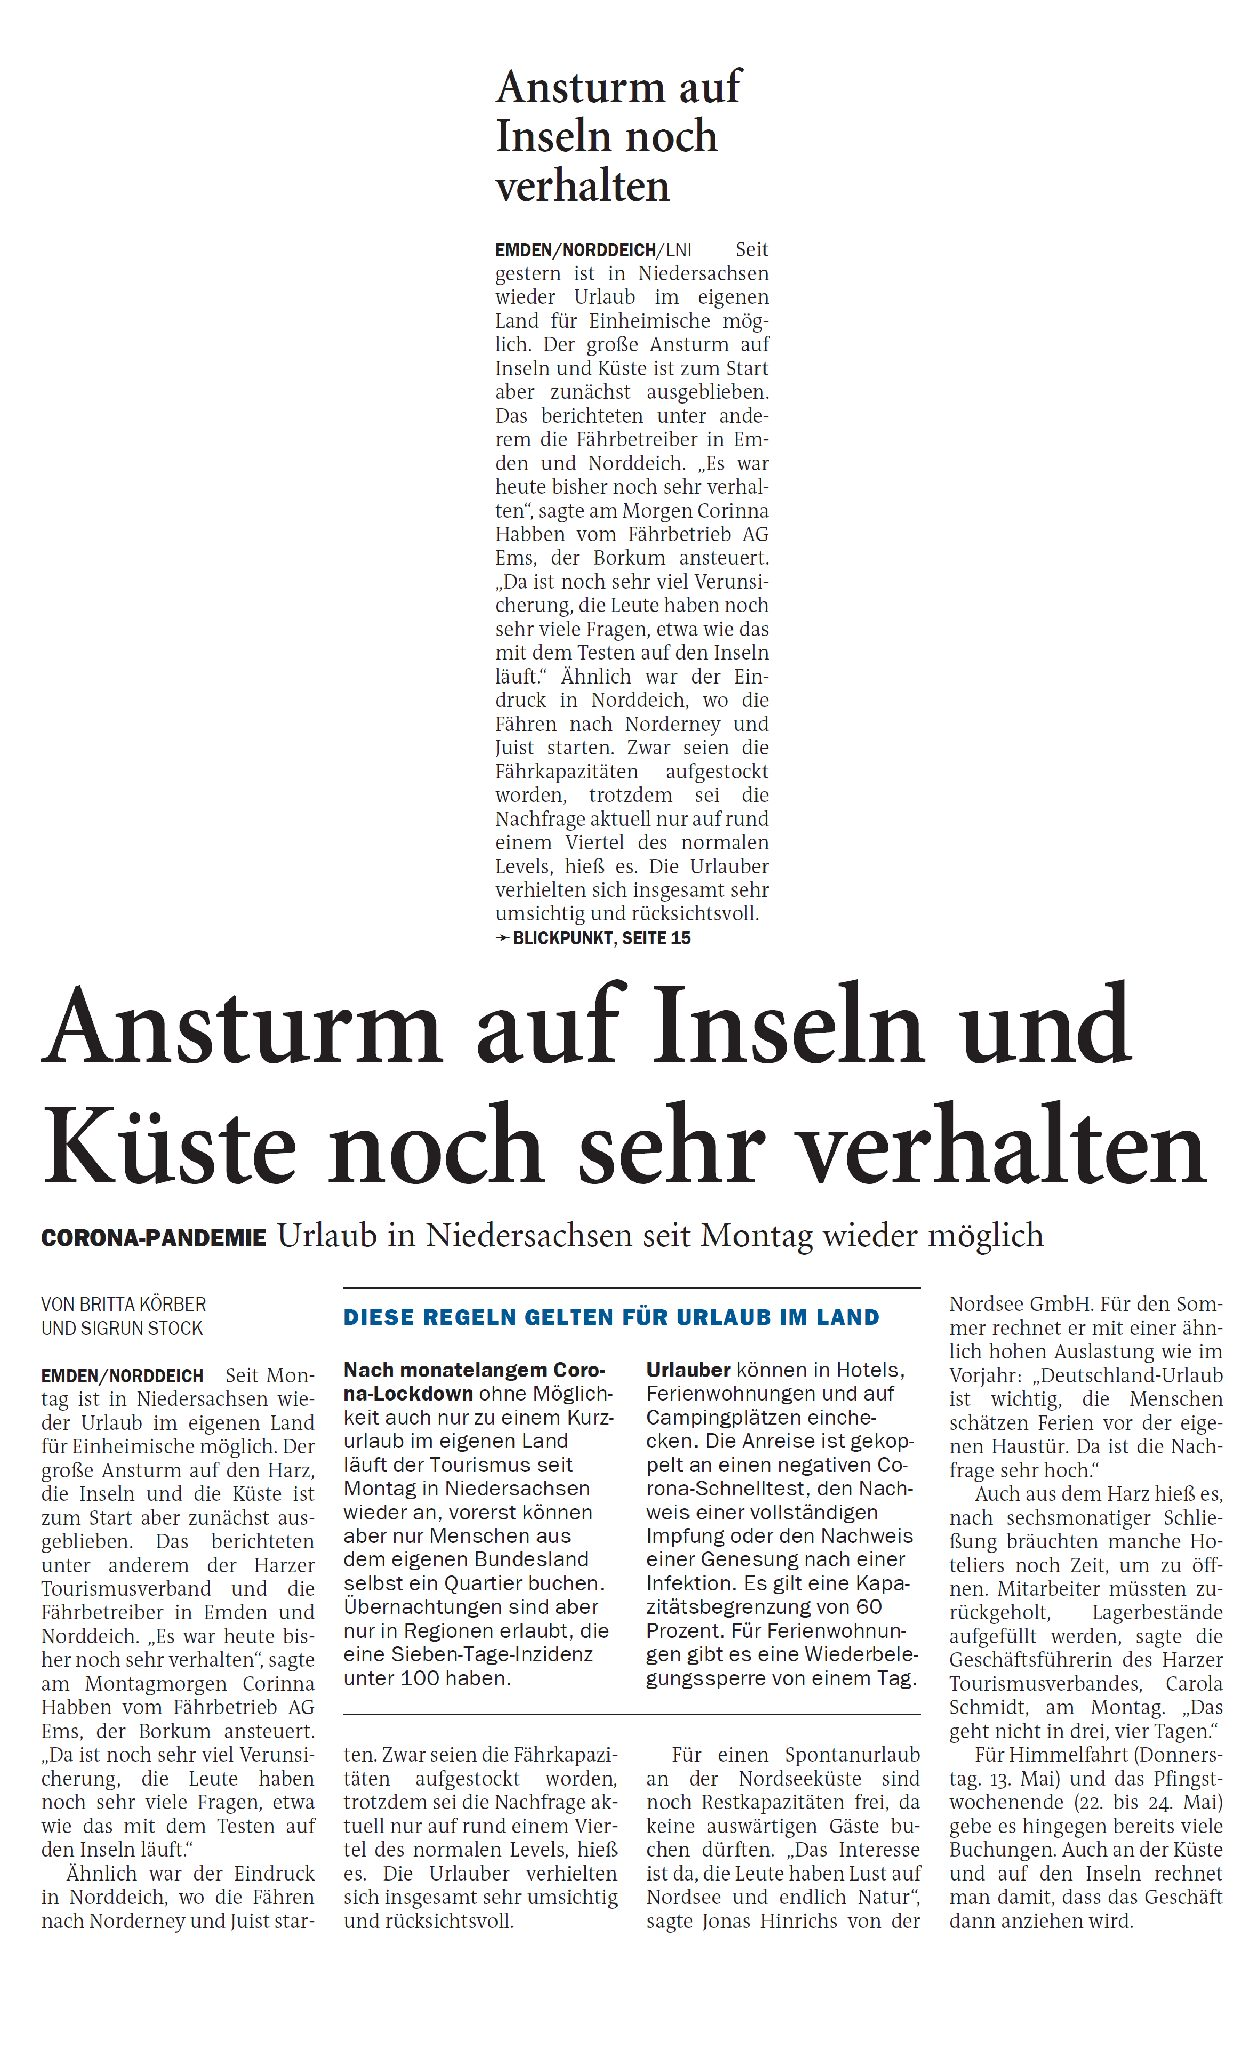 Jeversches Wochenblatt 11.05.2021 III